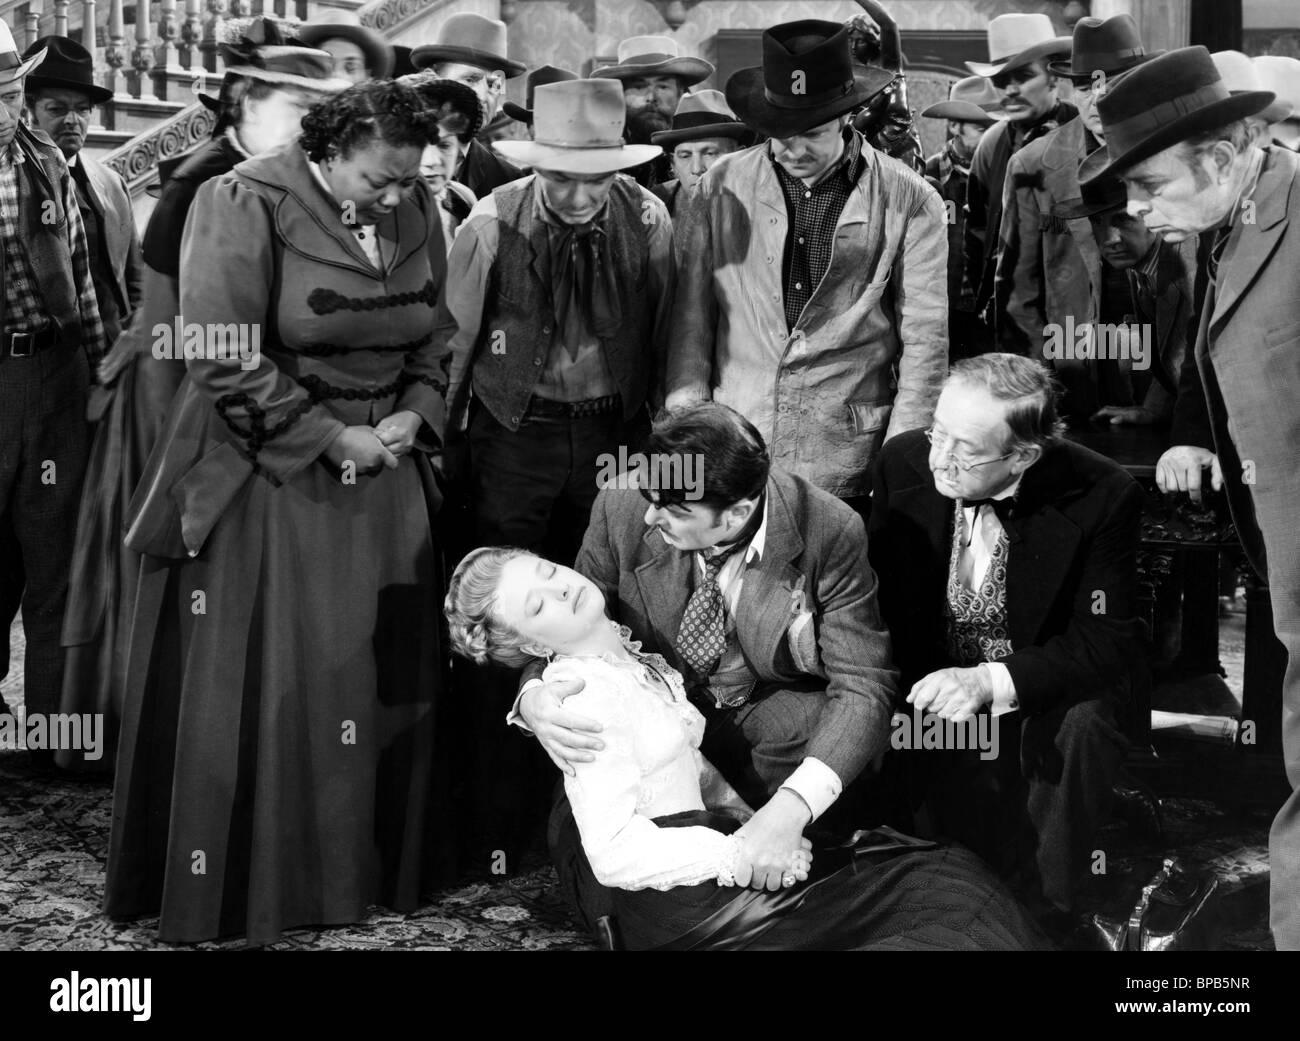 MARIETTA CANTY, PRISCILLA LANE, GEORGE BRENT, SPENCER CHARTERS, SILVER QUEEN, 1942 - Stock Image